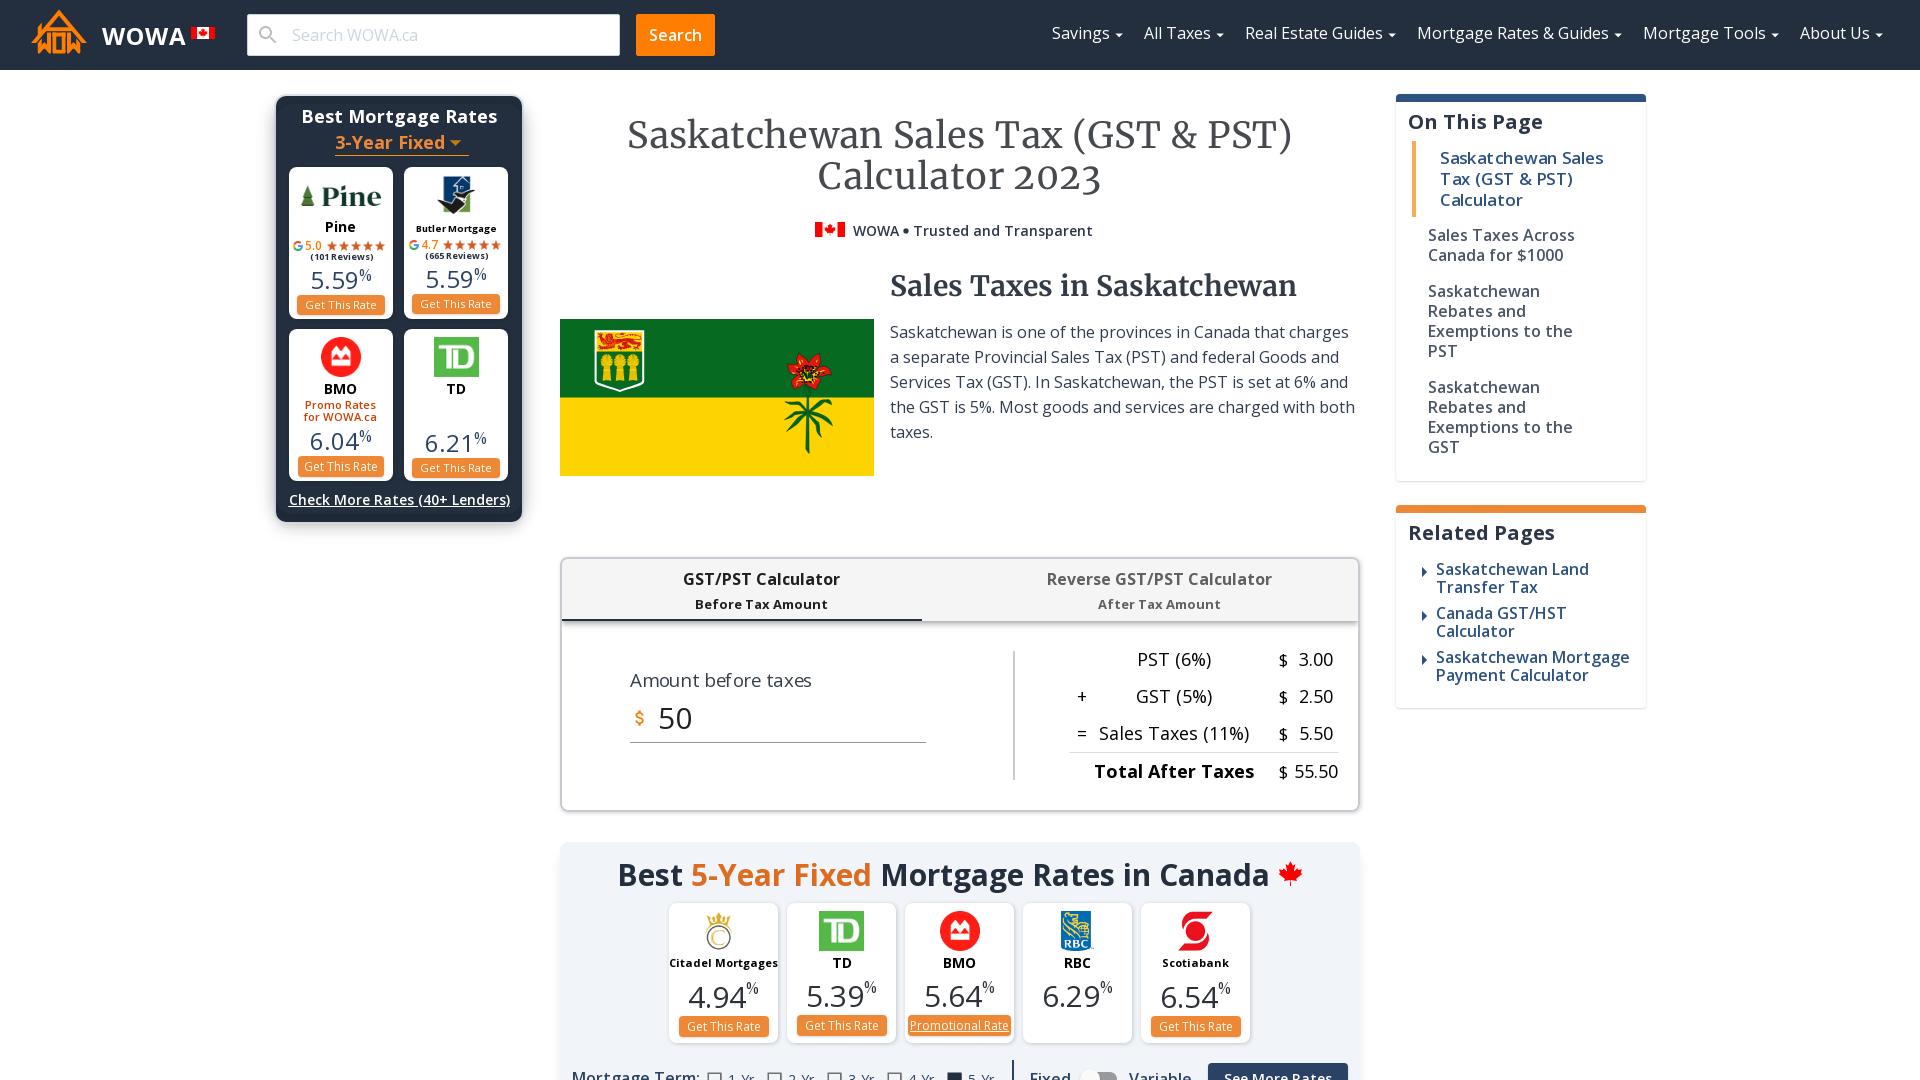 Saskatchewan Sales Tax Gst Pst Calculator 2021 Wowa Ca